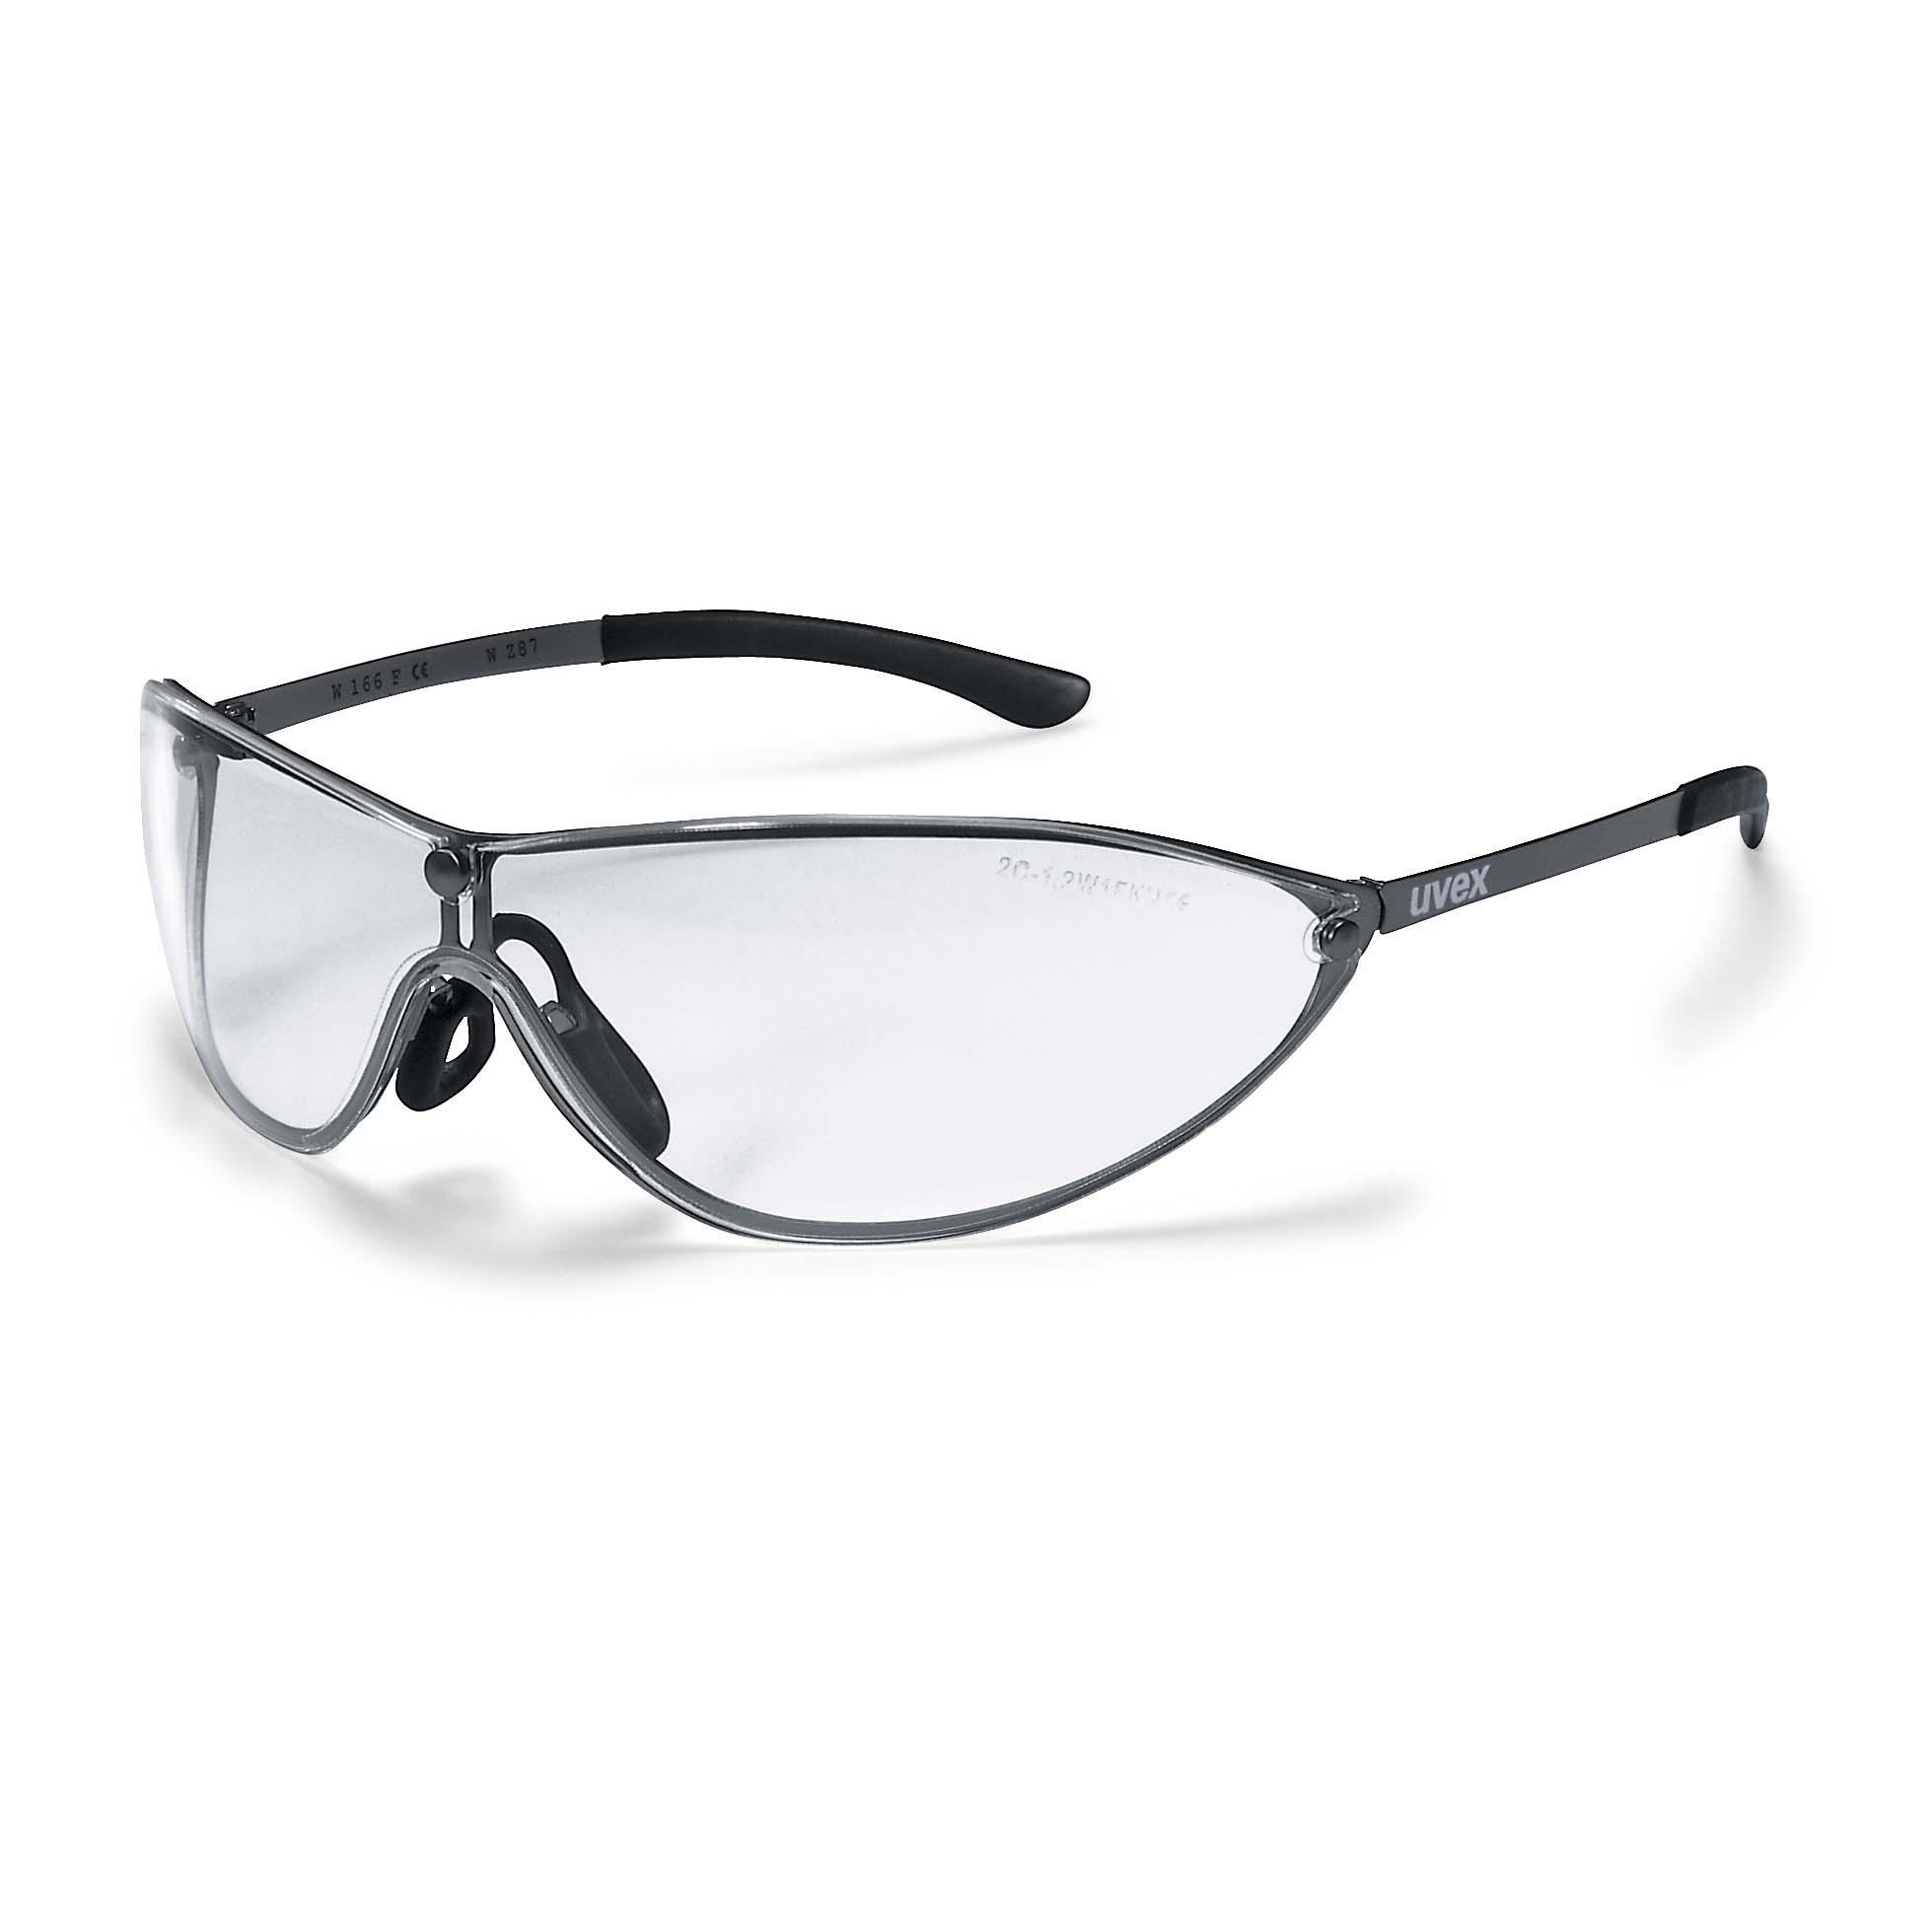 uvex-racer-safety-specs